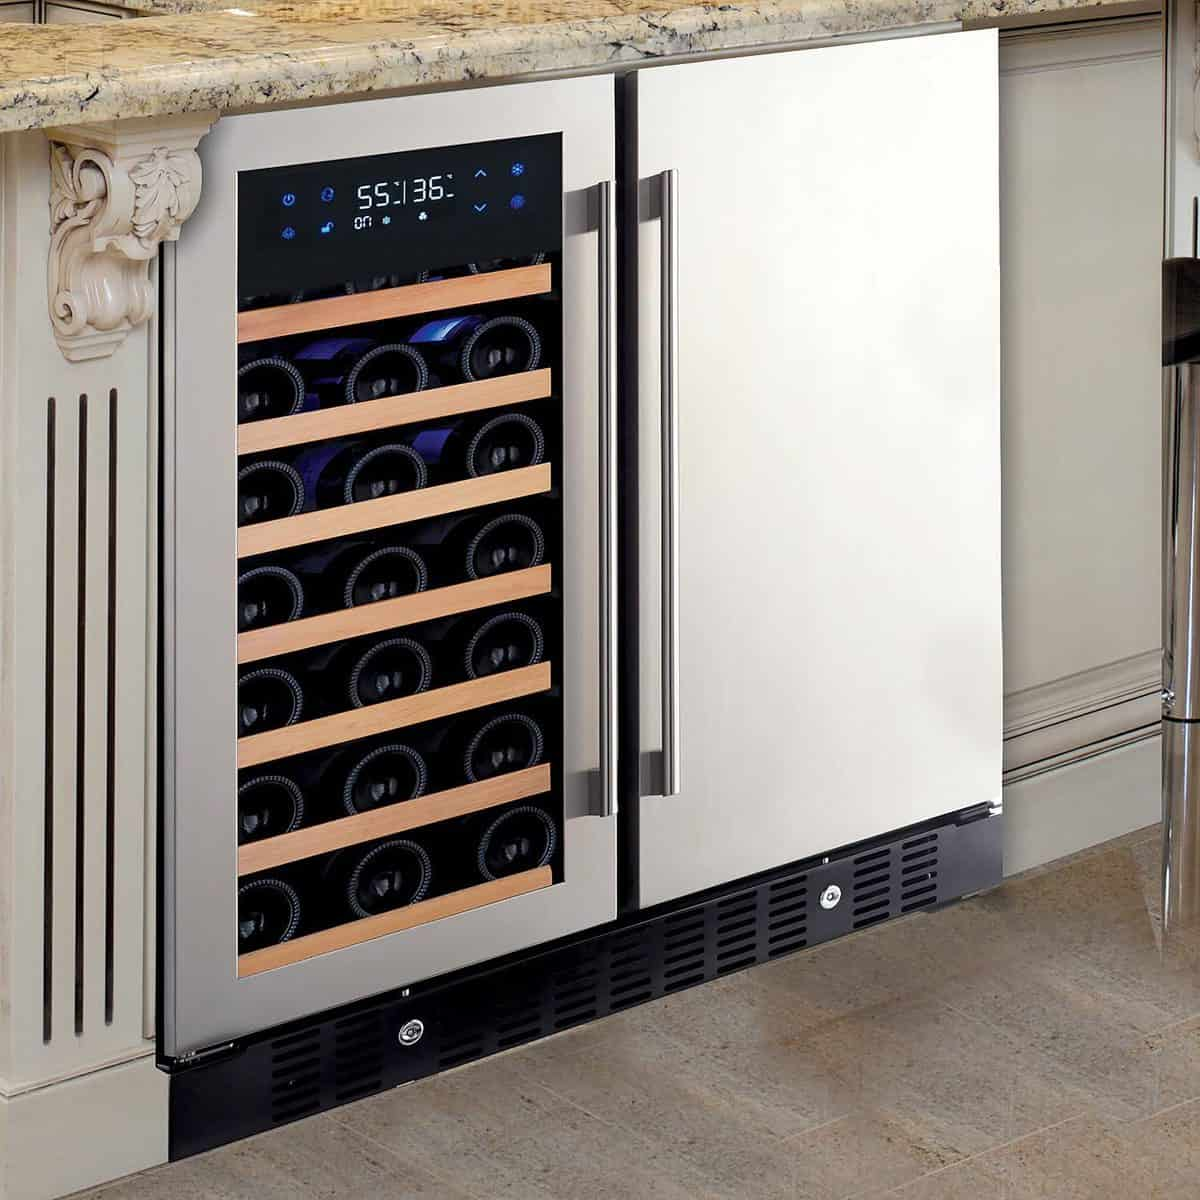 N'Finity Pro HDX Dual Zone Wine Fridge